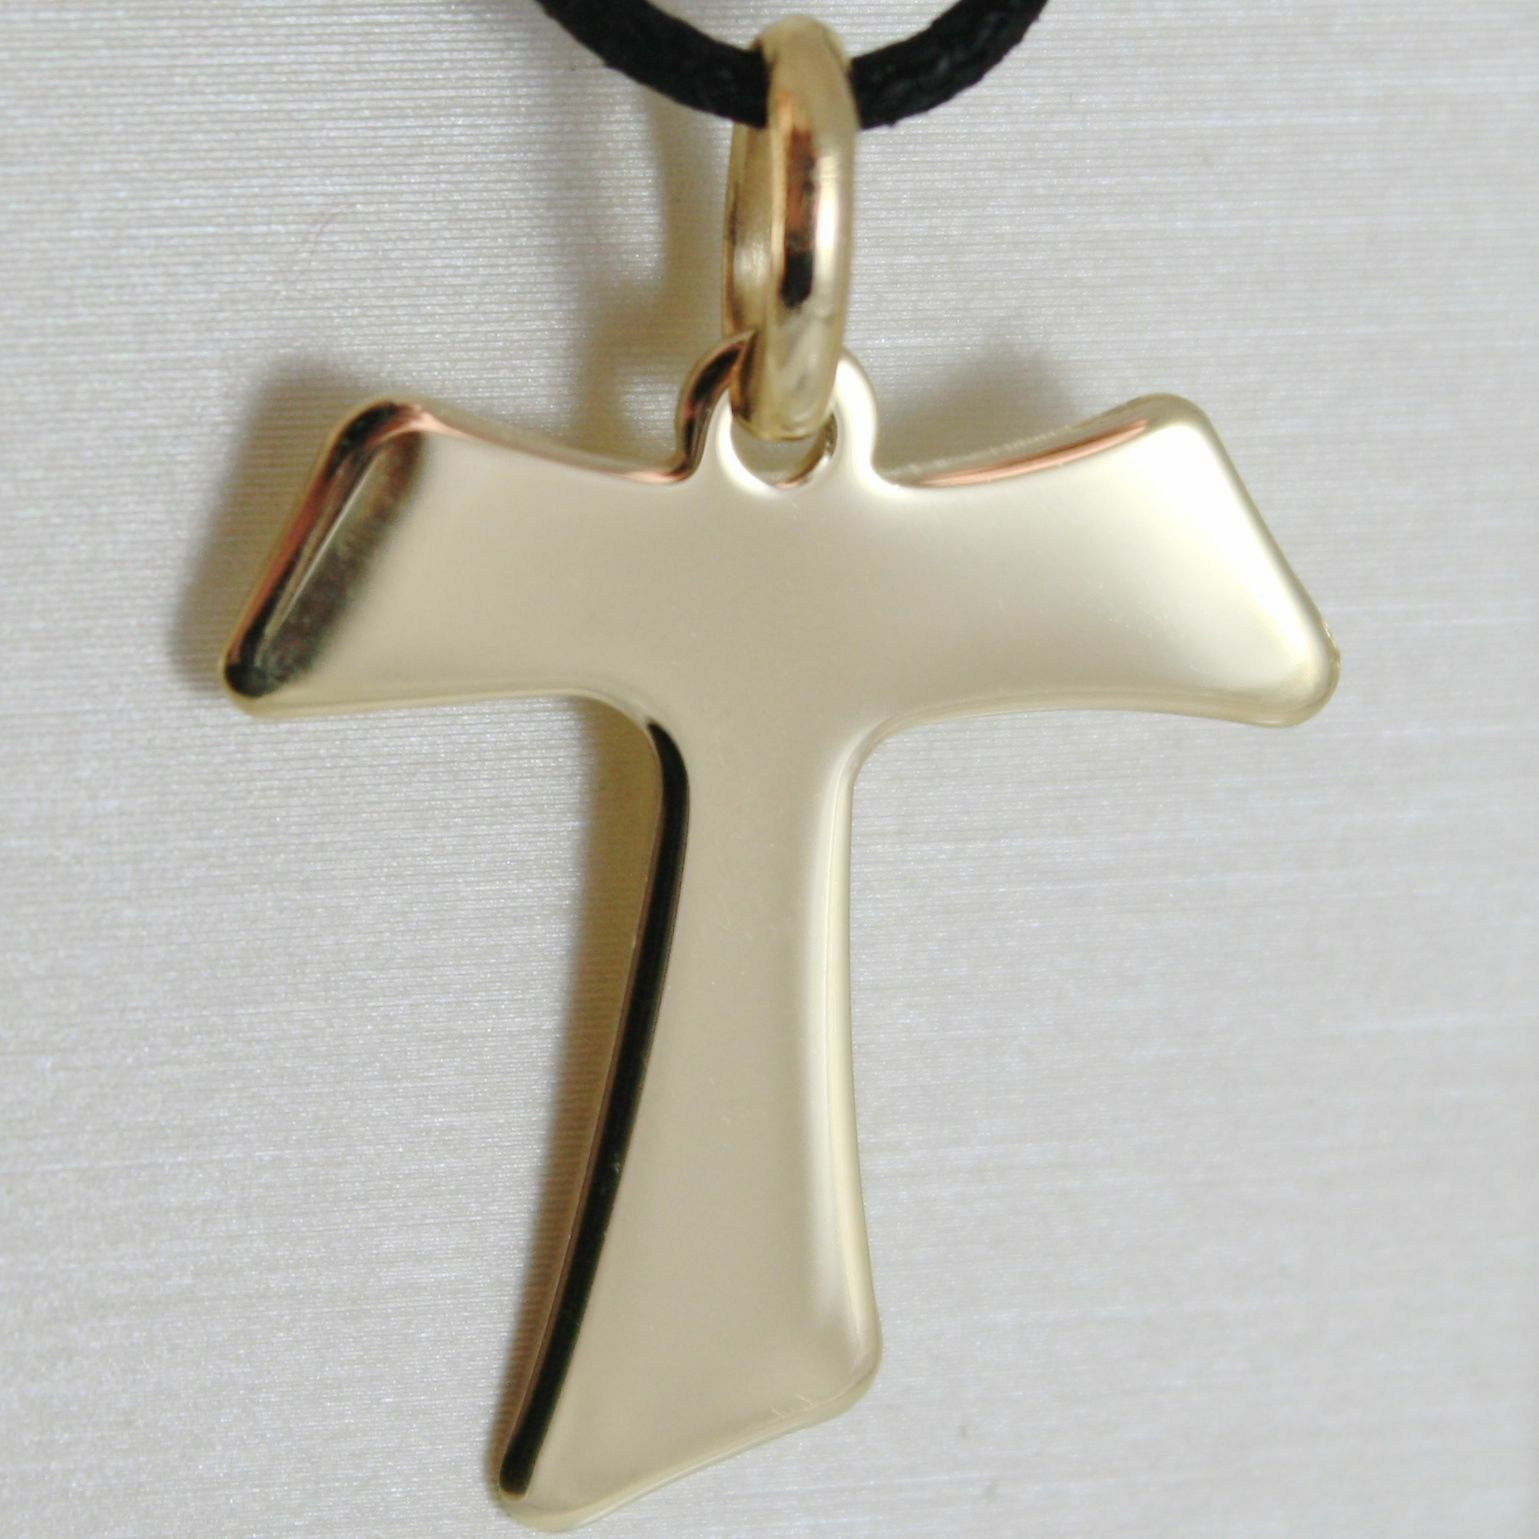 Flat yellow gold cross 750 18k pendant Franciscan tau,, san francesco, Italy